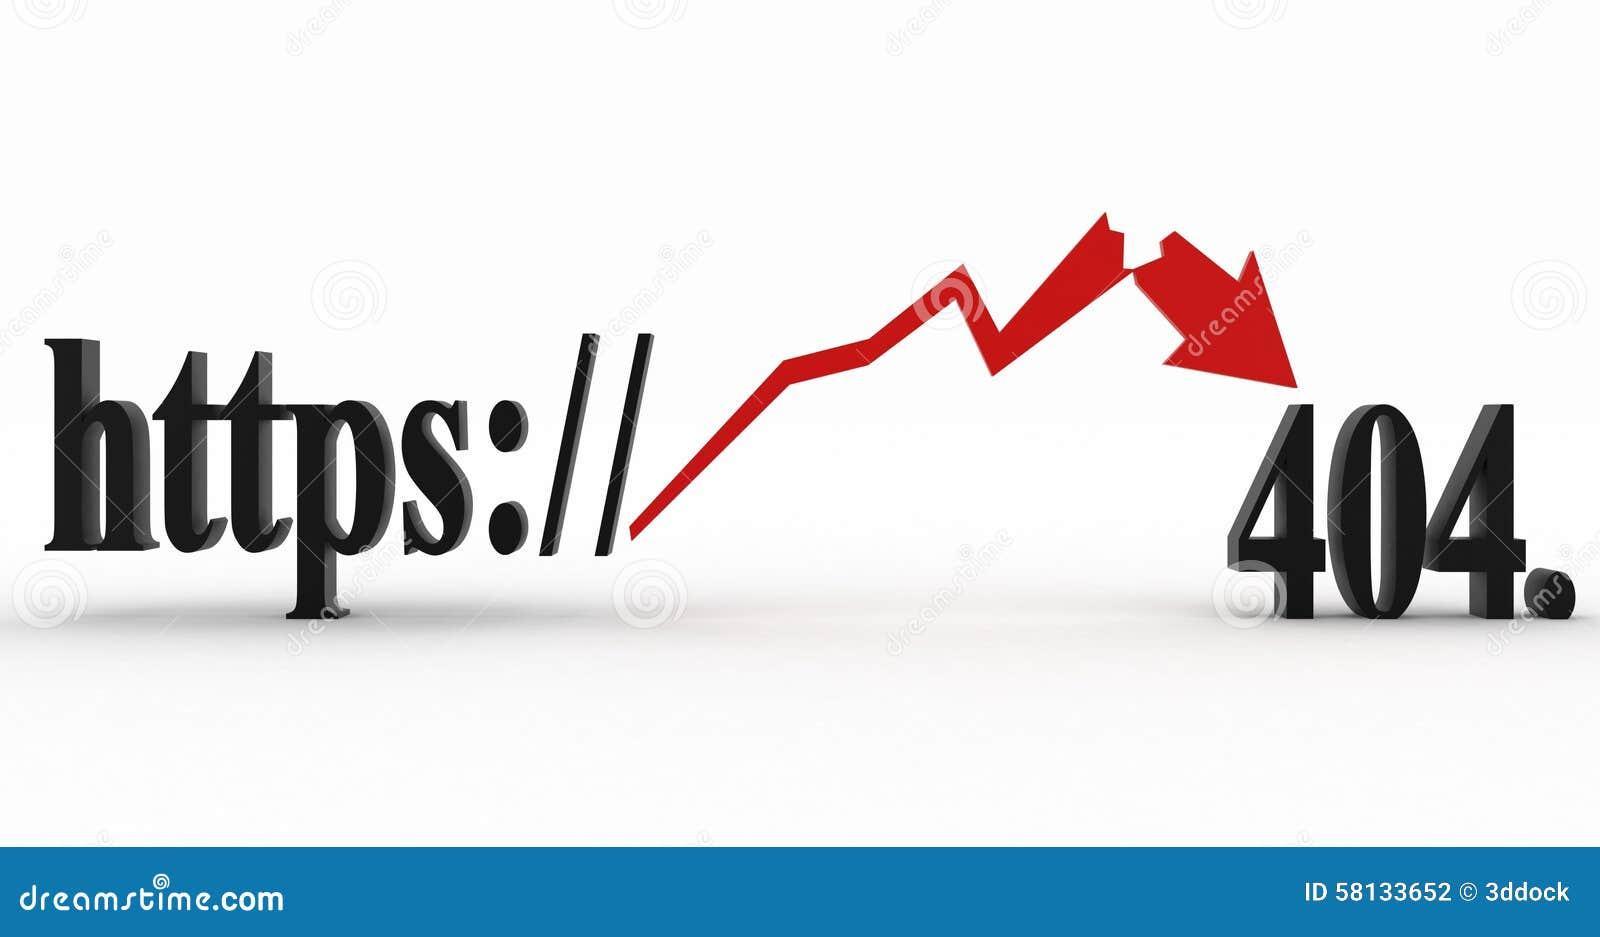 HTTP Not Found Error Code 404 Stock Illustration